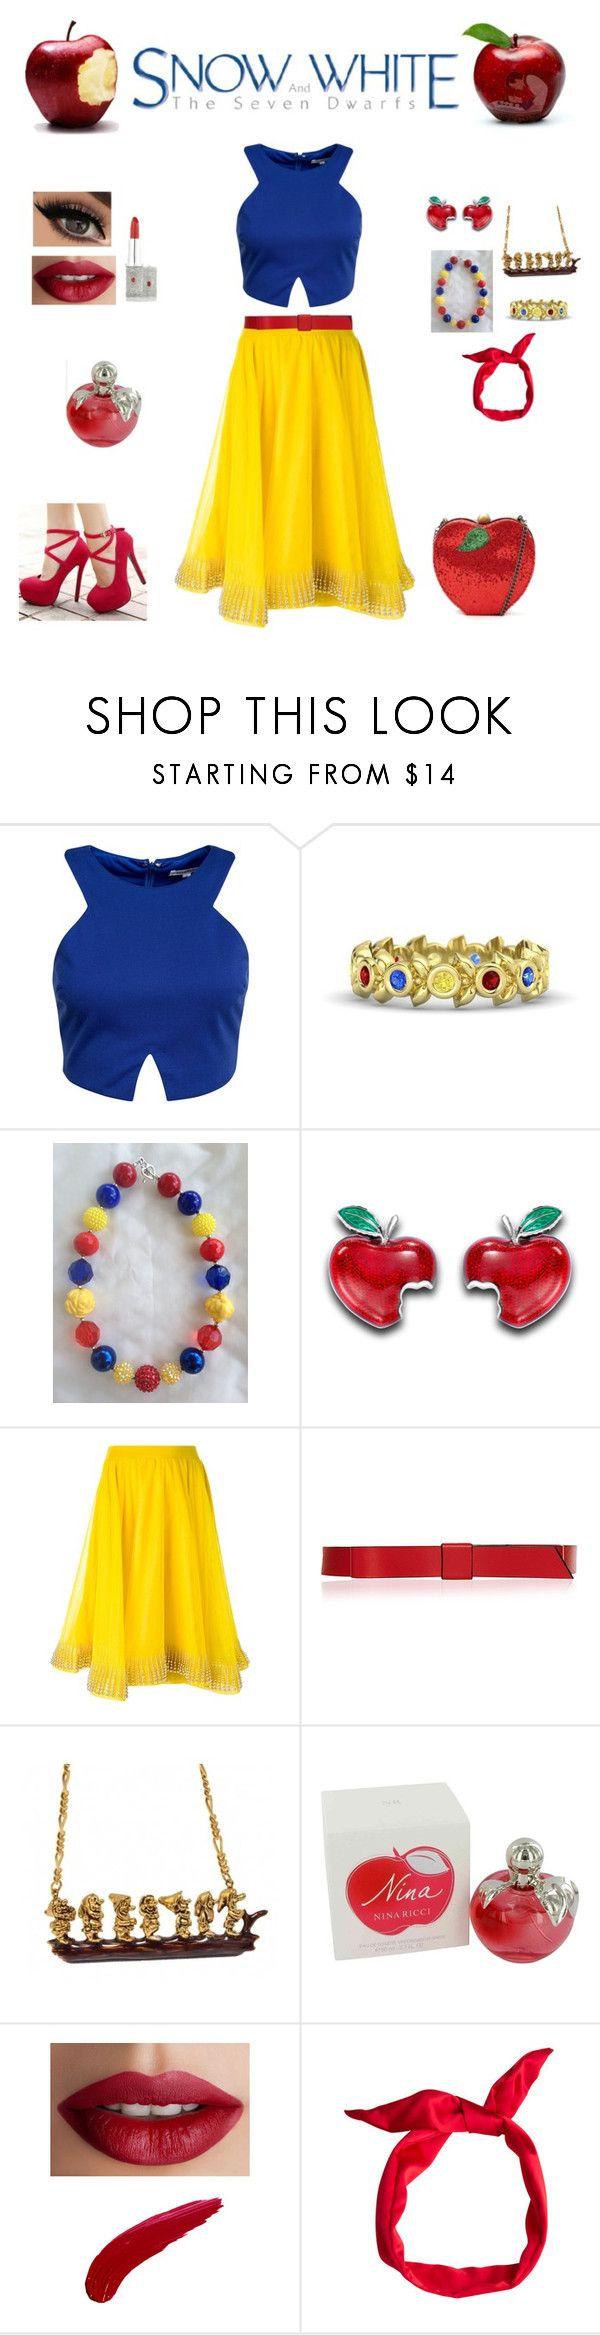 """Snow White contest entry"" by allycat95 ❤ liked on Polyvore featuring Glamorous, Gemvara, Disney, Manish Arora, Marni, Nina Ricci, TheBalm, BB Dakota, women's clothing and women's fashion"